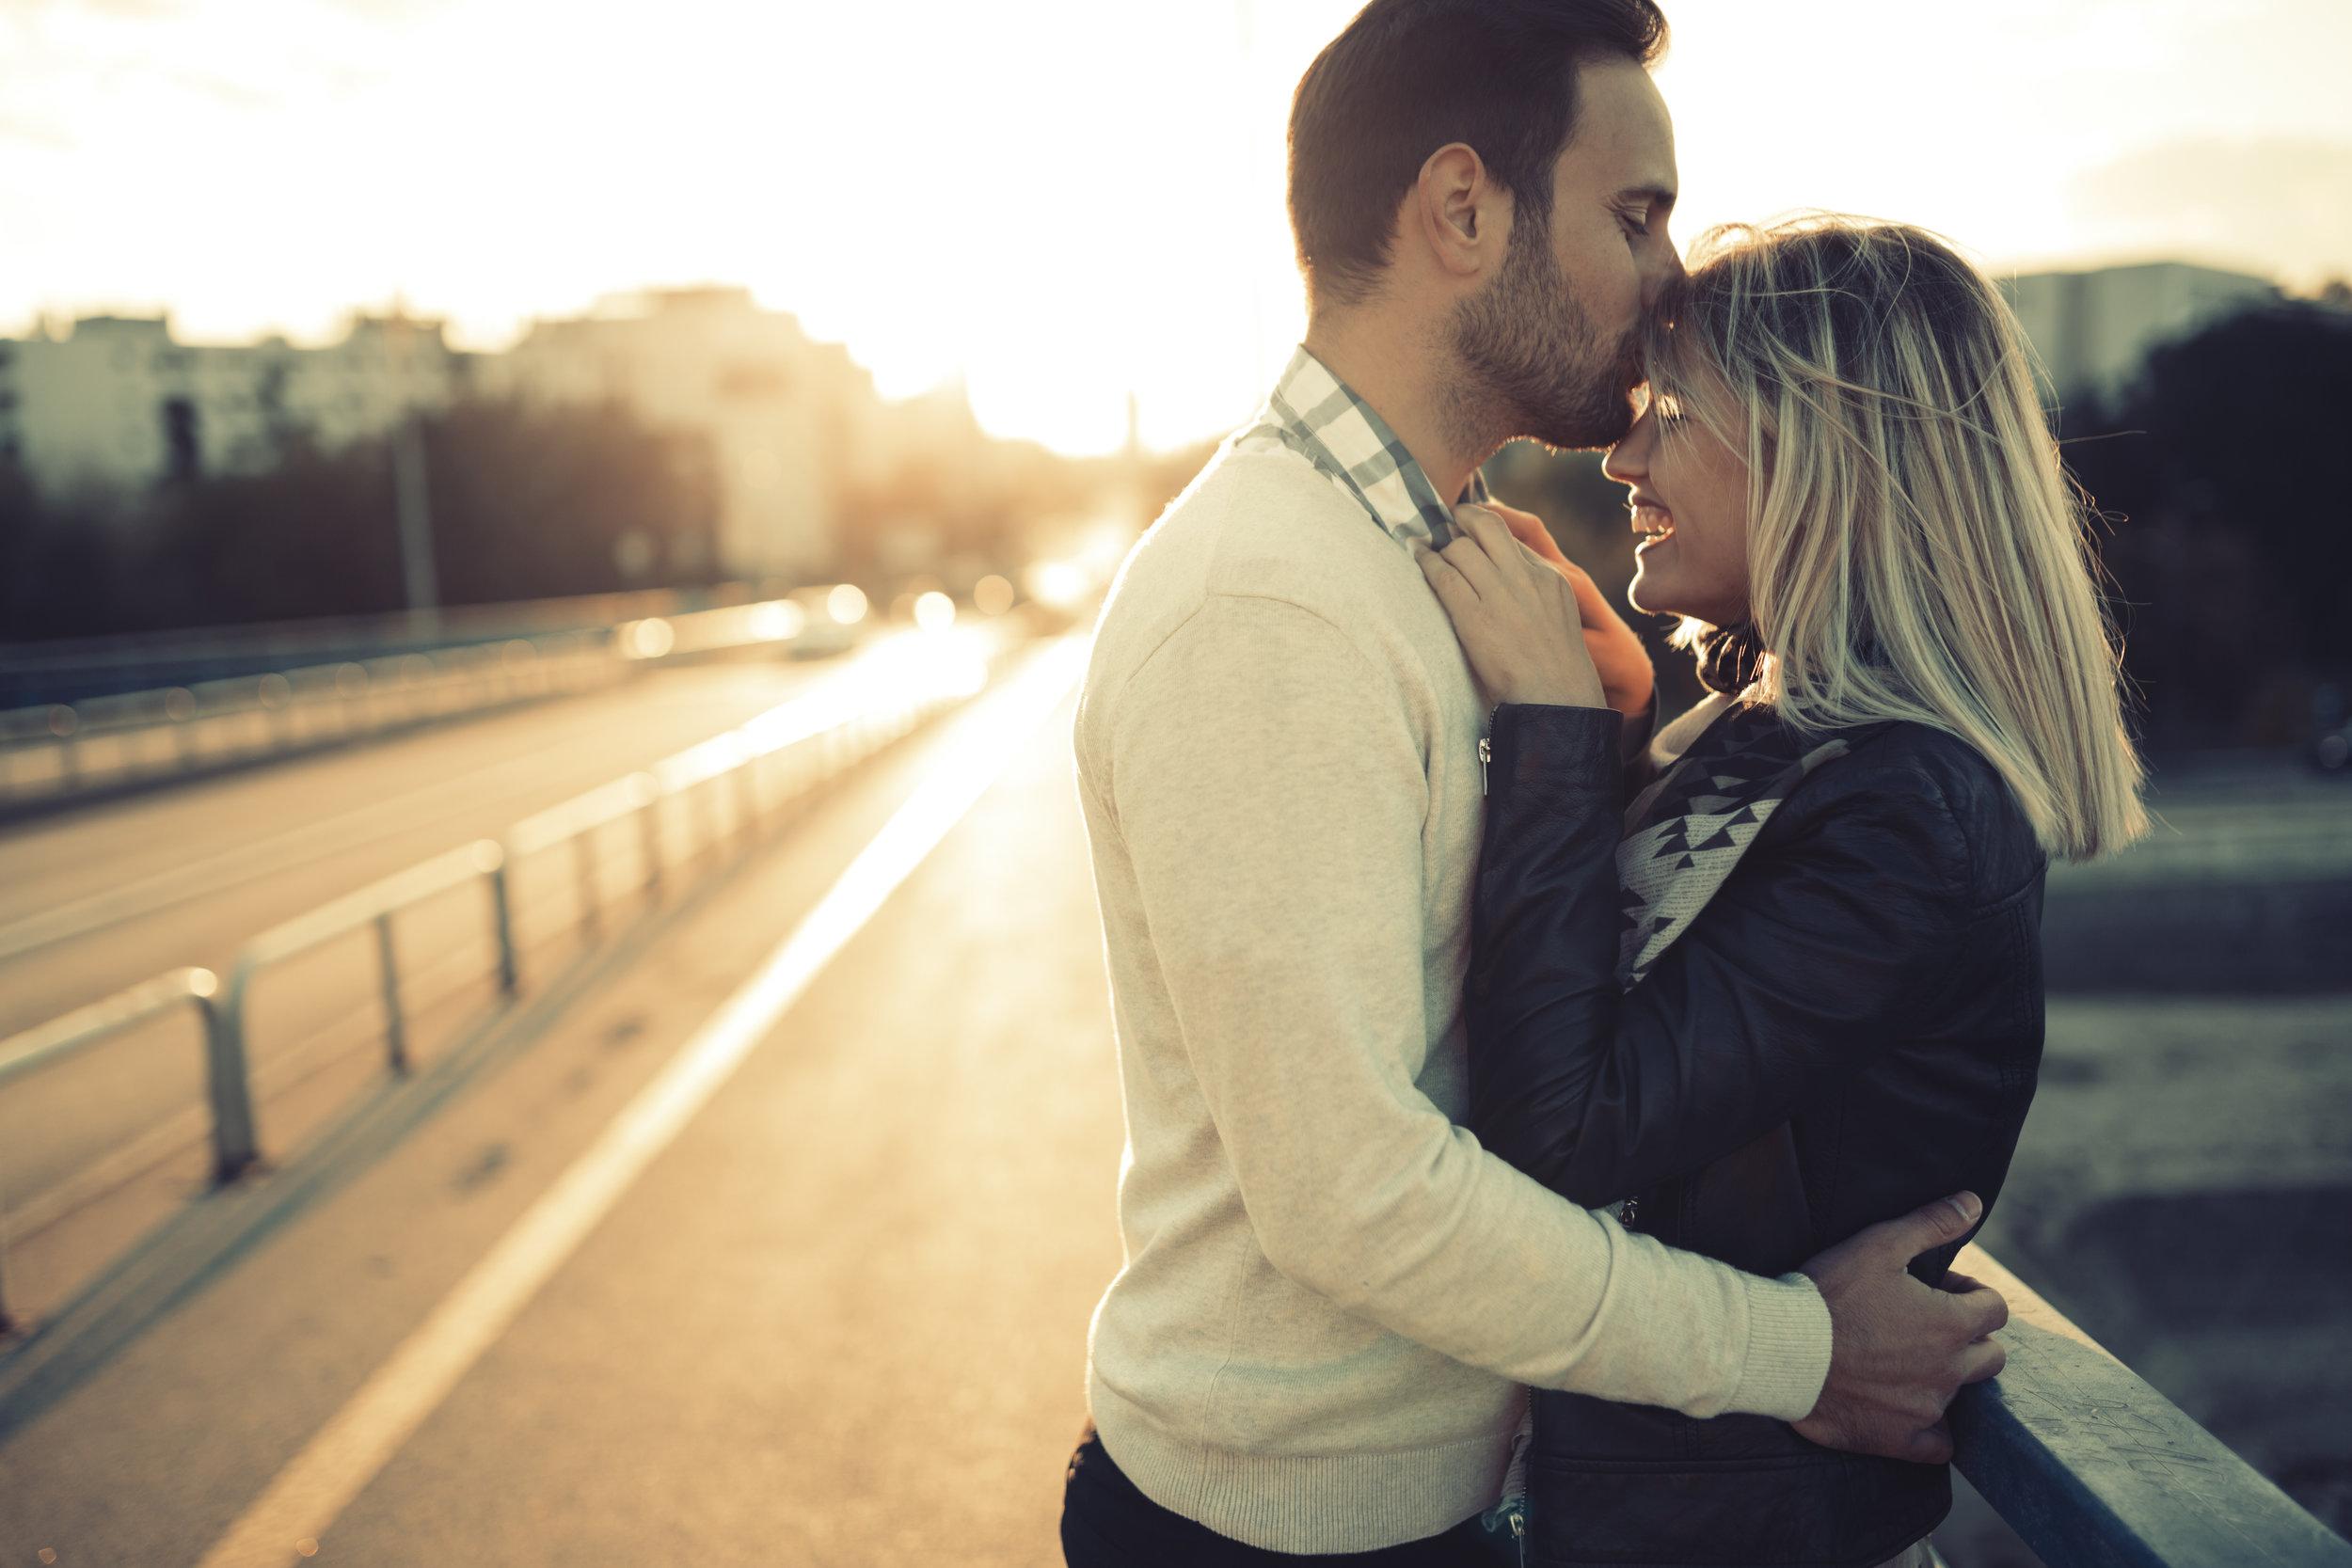 Couple kissing on a bridge smiling .jpg